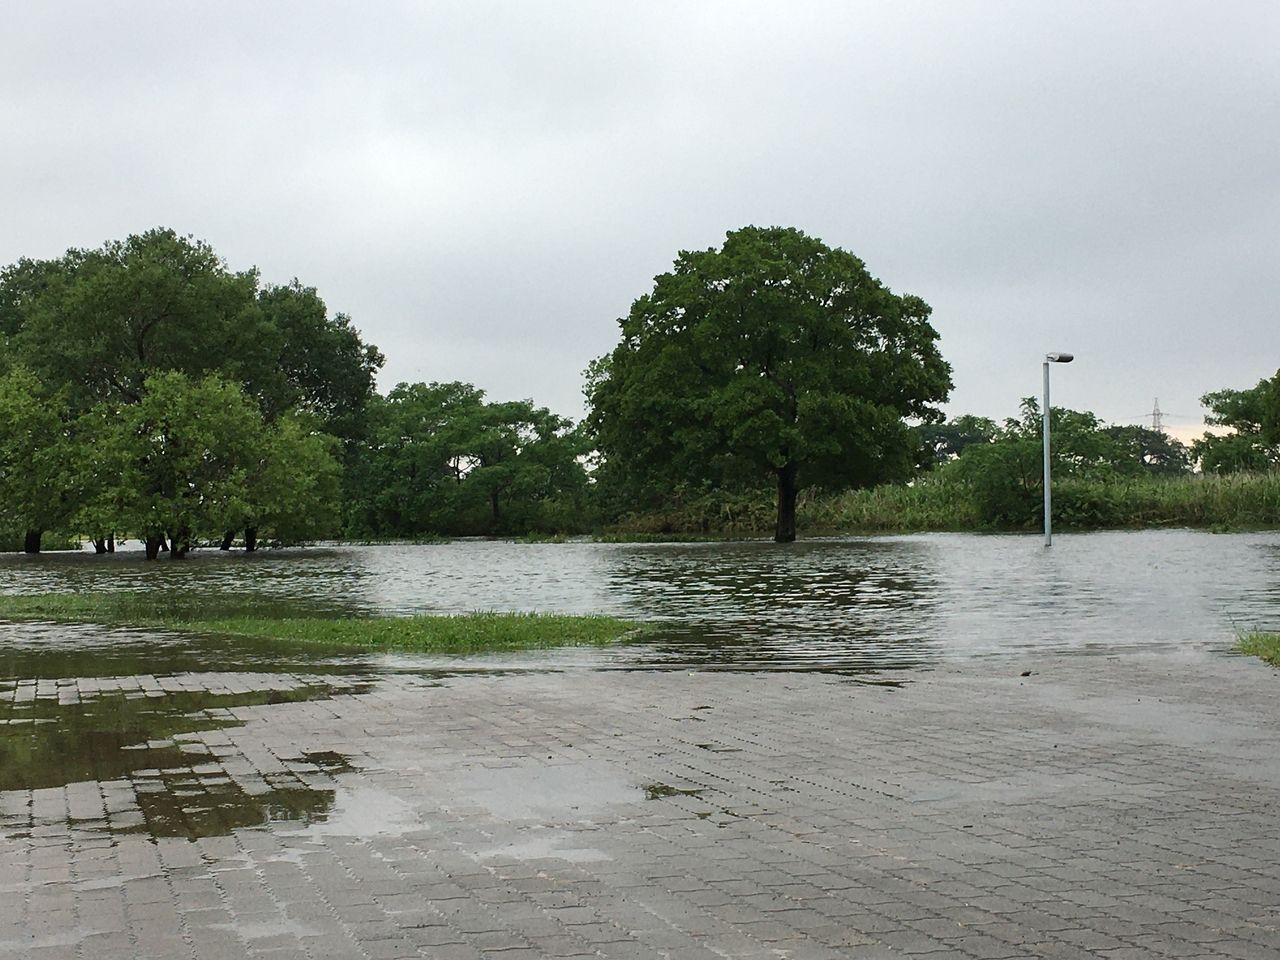 熊本市 水前寺江津湖公園・広木地区 今年も今回の雨で一部冠水